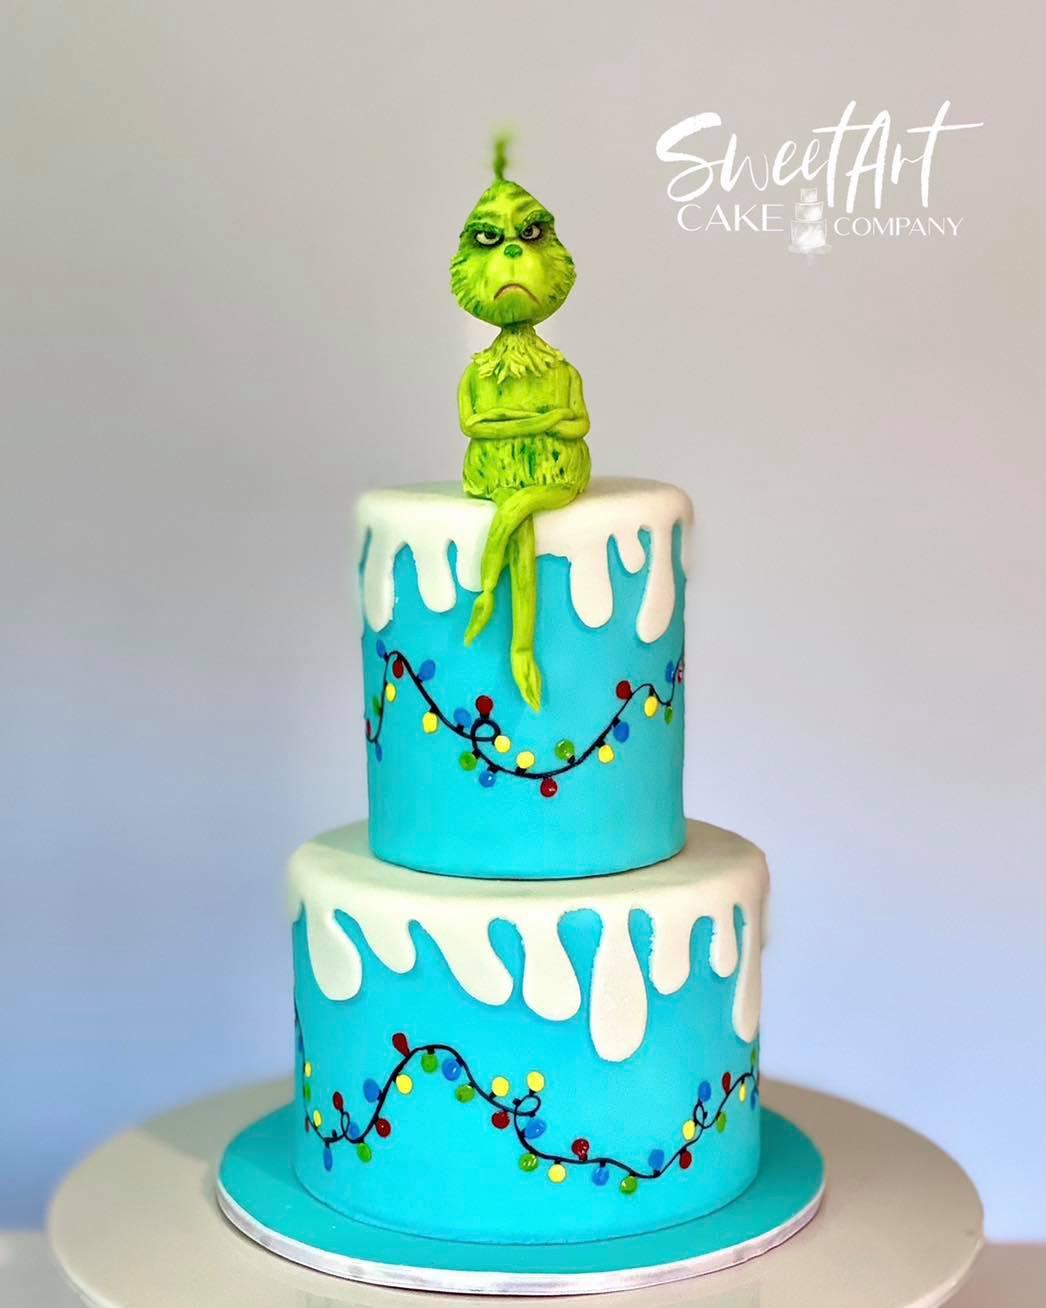 2018 Grinch Cake